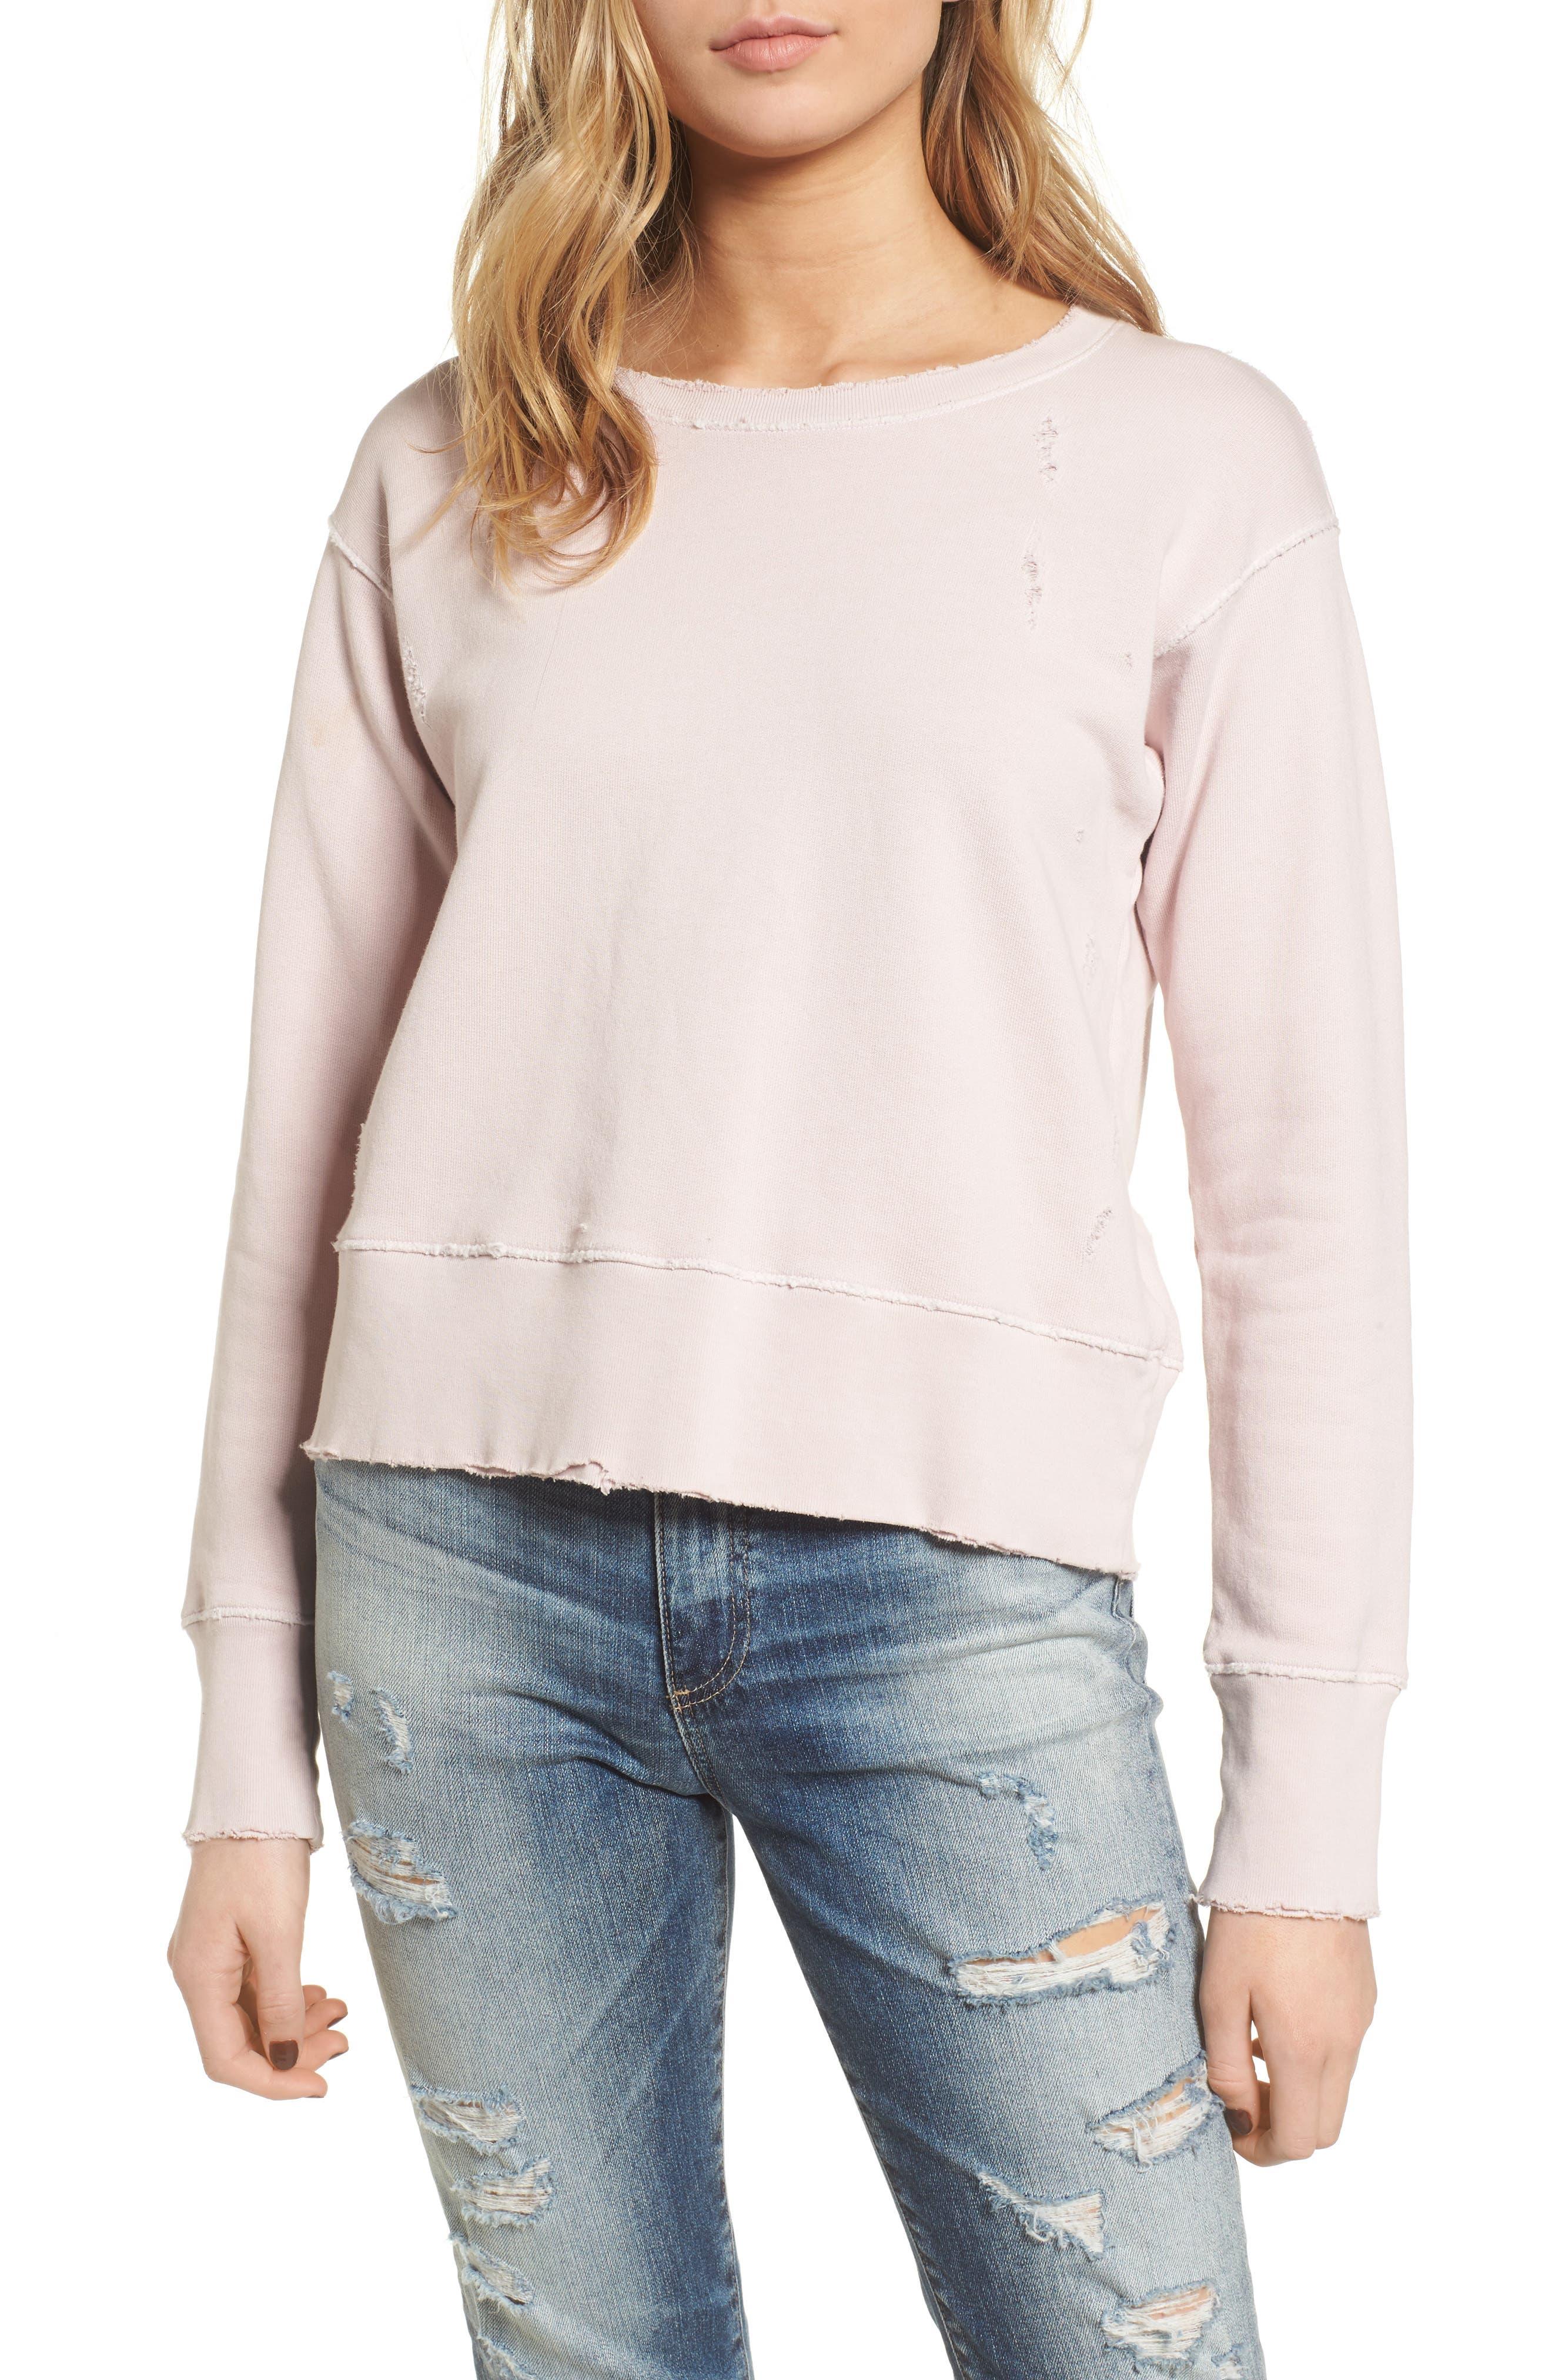 Tee Lab Cotton Sweatshirt,                         Main,                         color, Bazooka 10 Year Vintage Wash